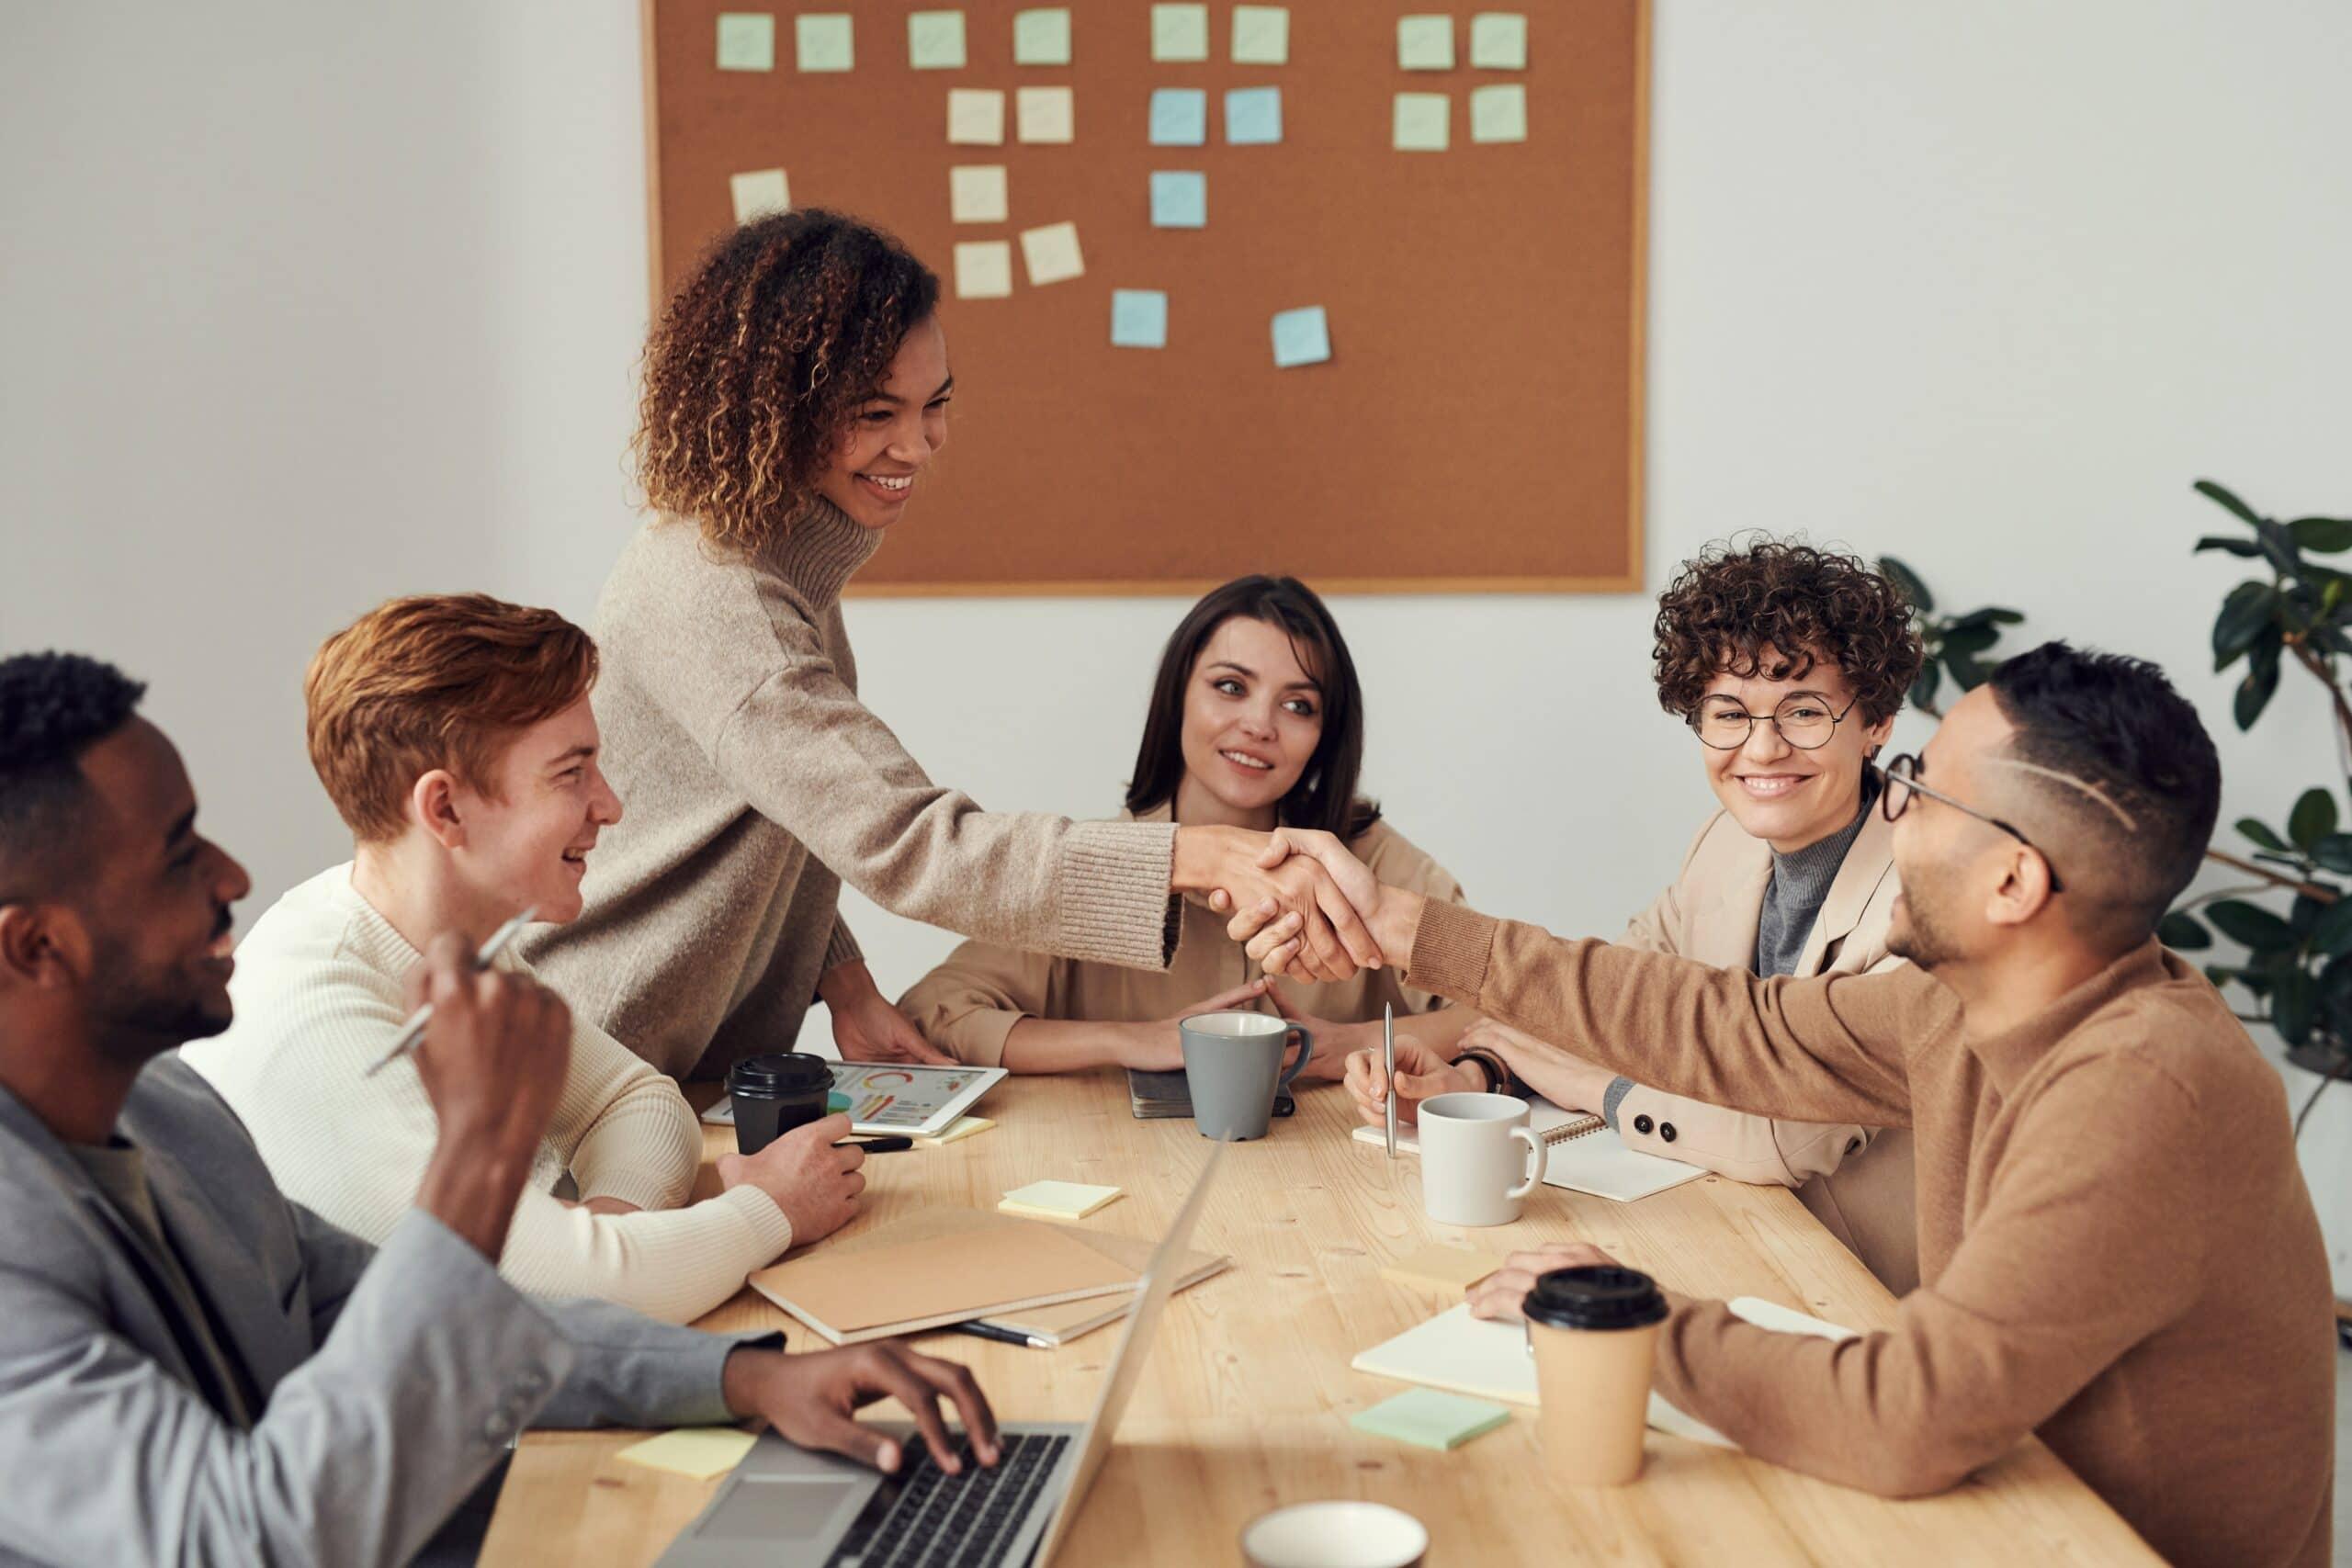 Intranet Best Practices that Improve Internal Communication